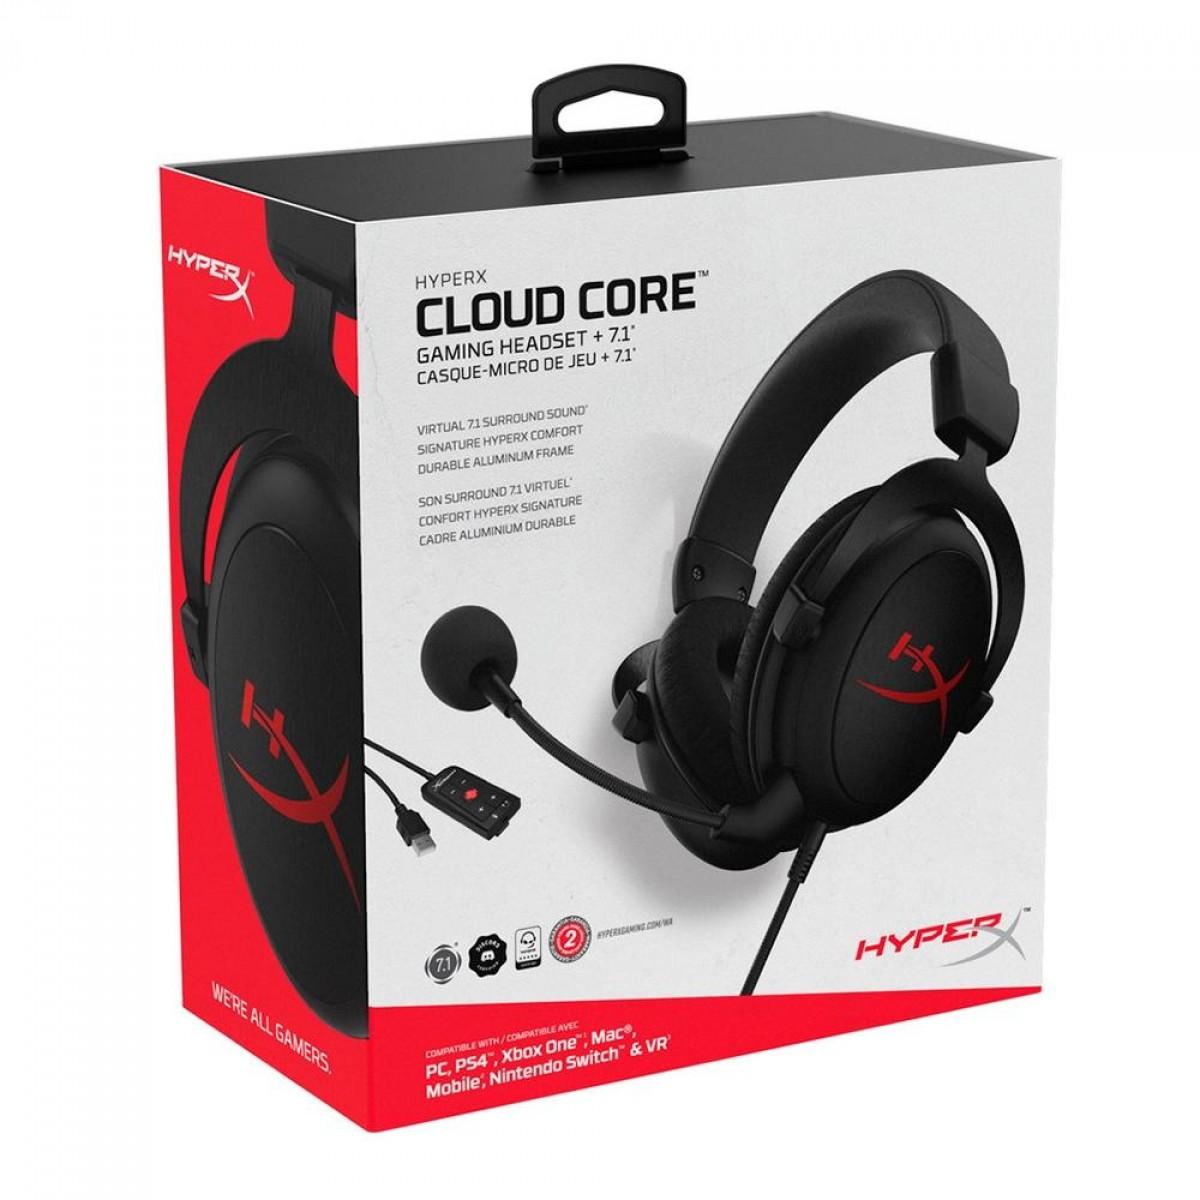 Headset Gamer HyperX Cloud Core, Surround 7.1, P3 ou USB, Black, HX-HSCC-2-BK/WW